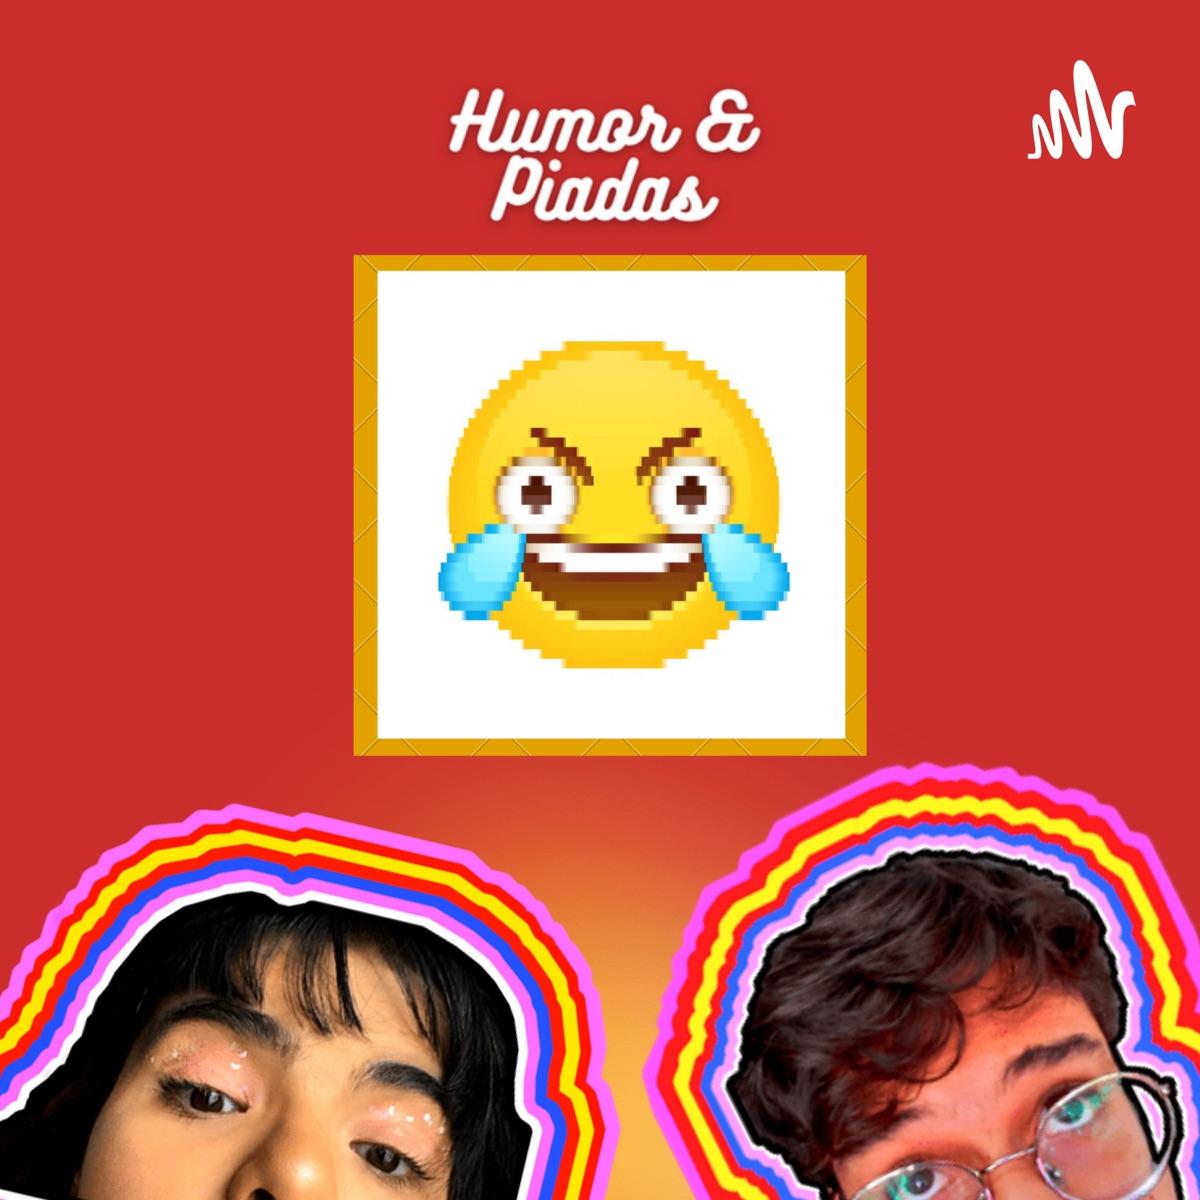 Humor & Piadas